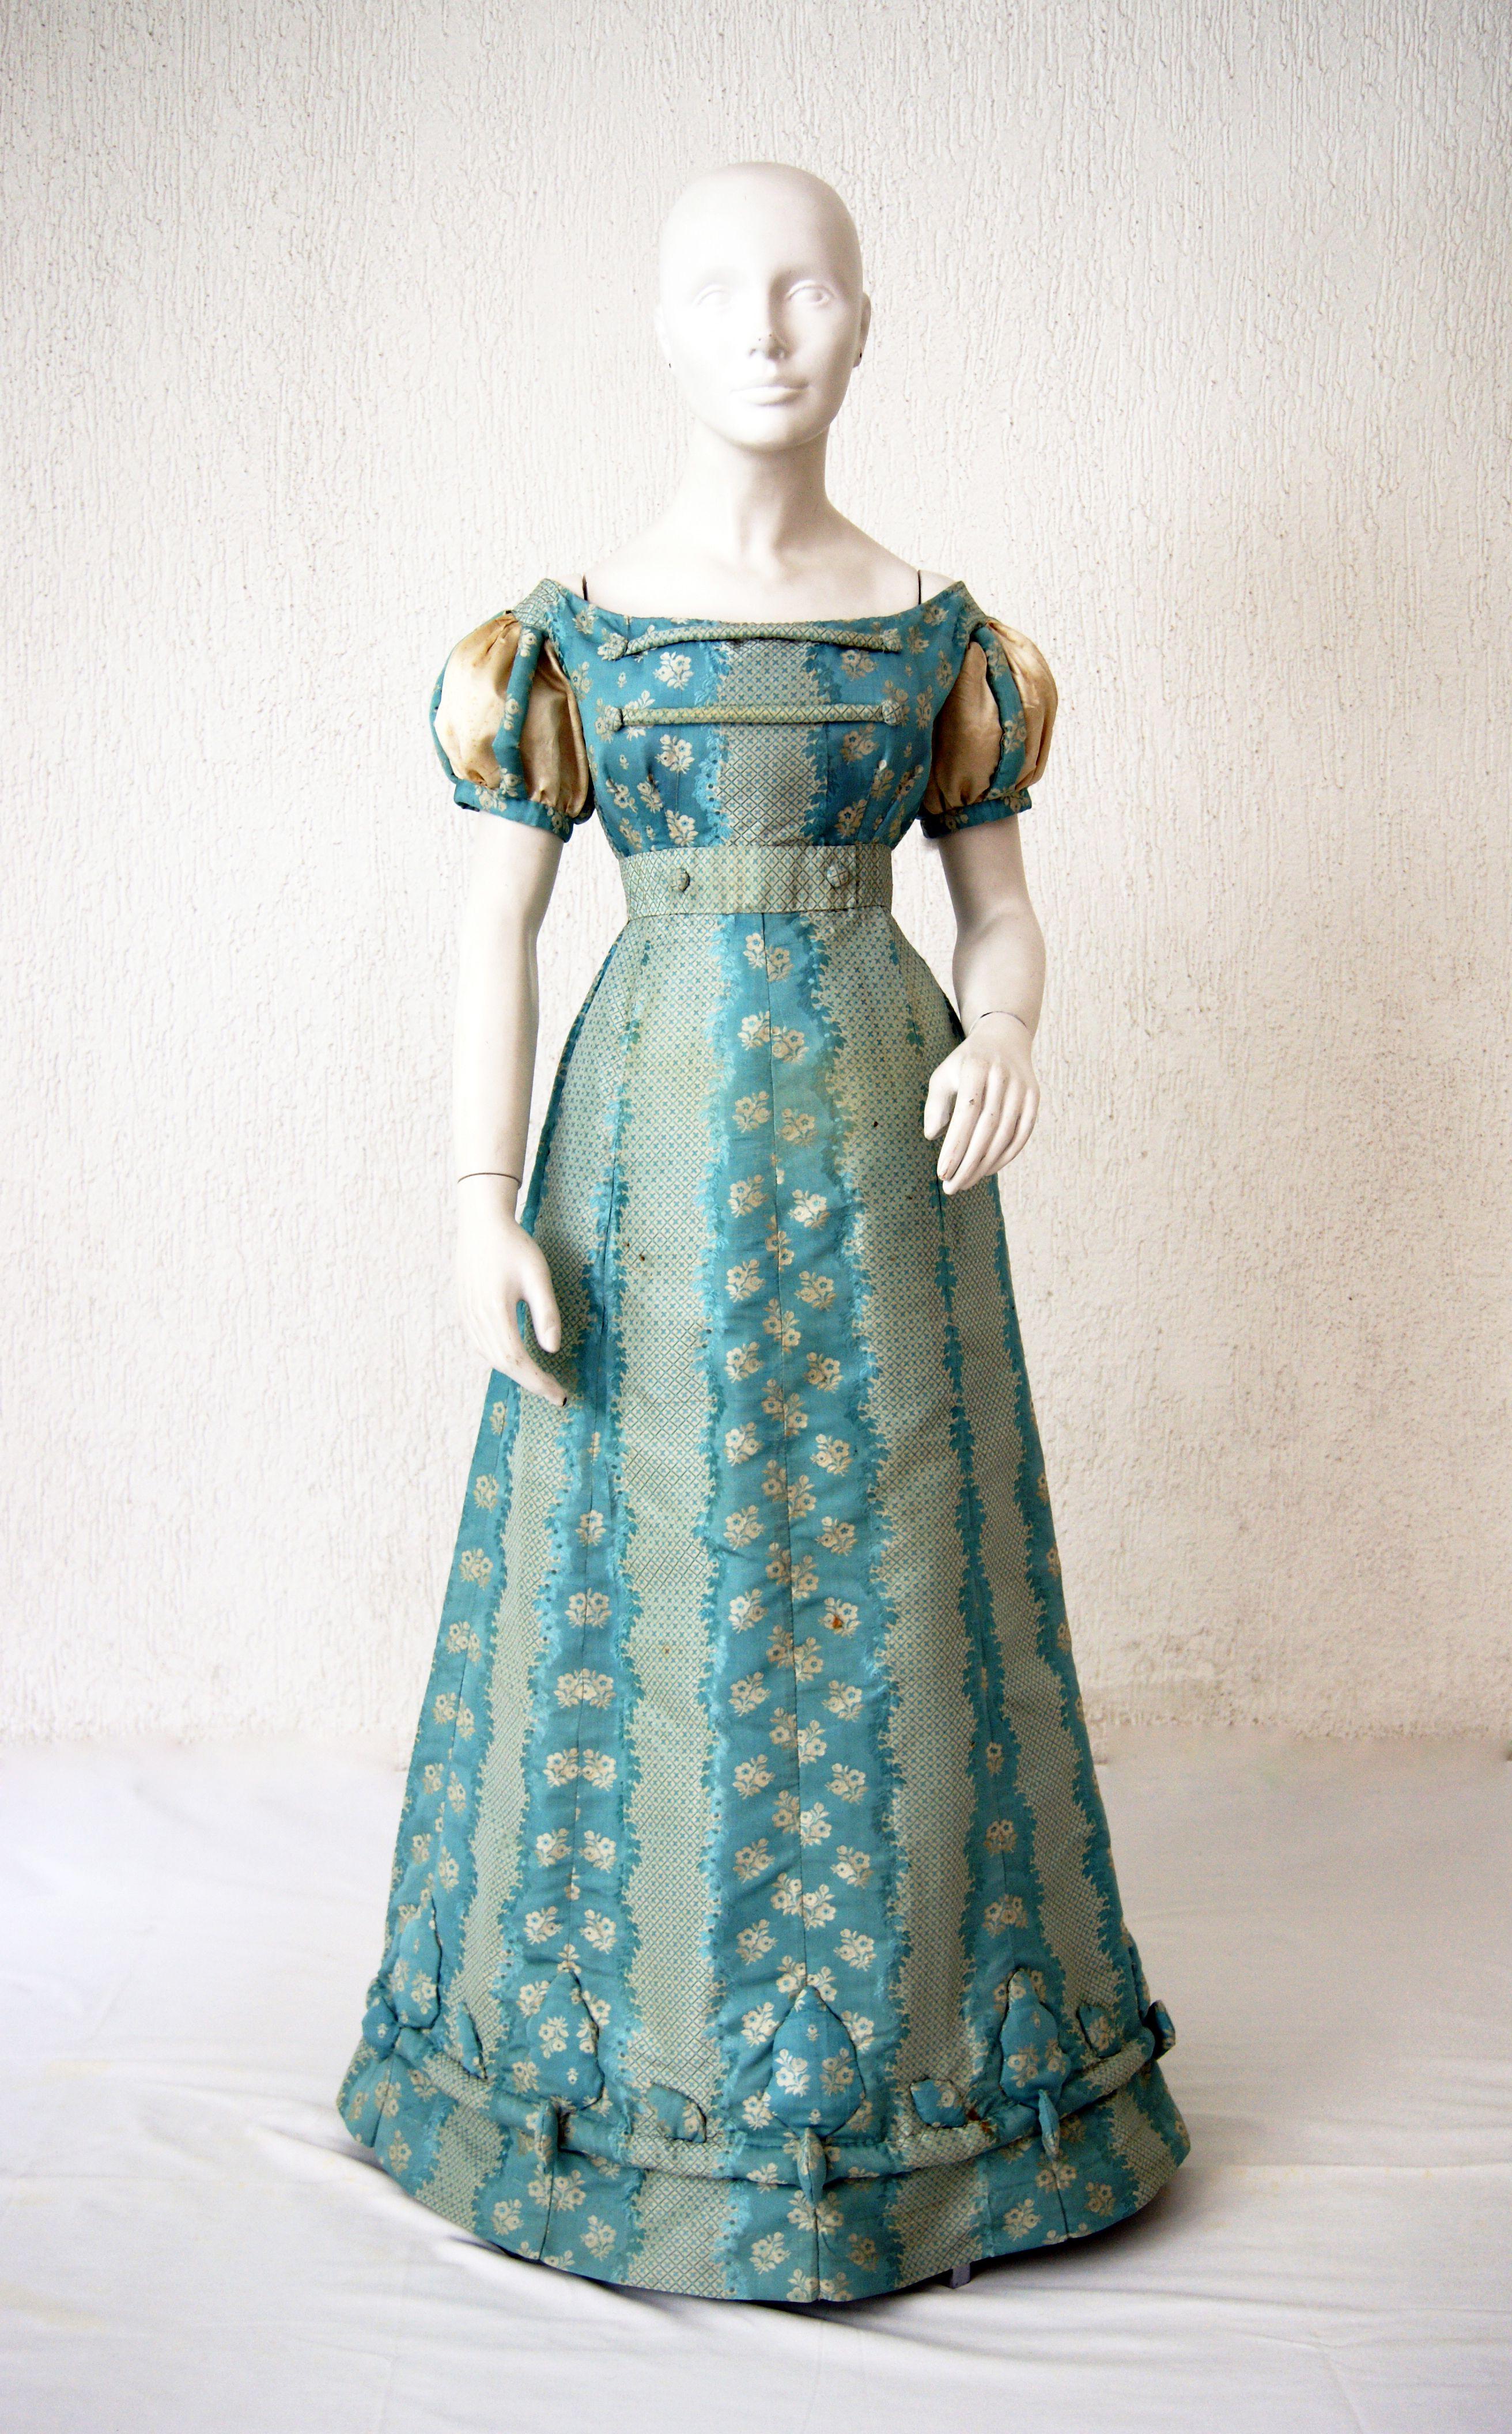 c. 20 Reception dress in silk taffeta printed with ornaments